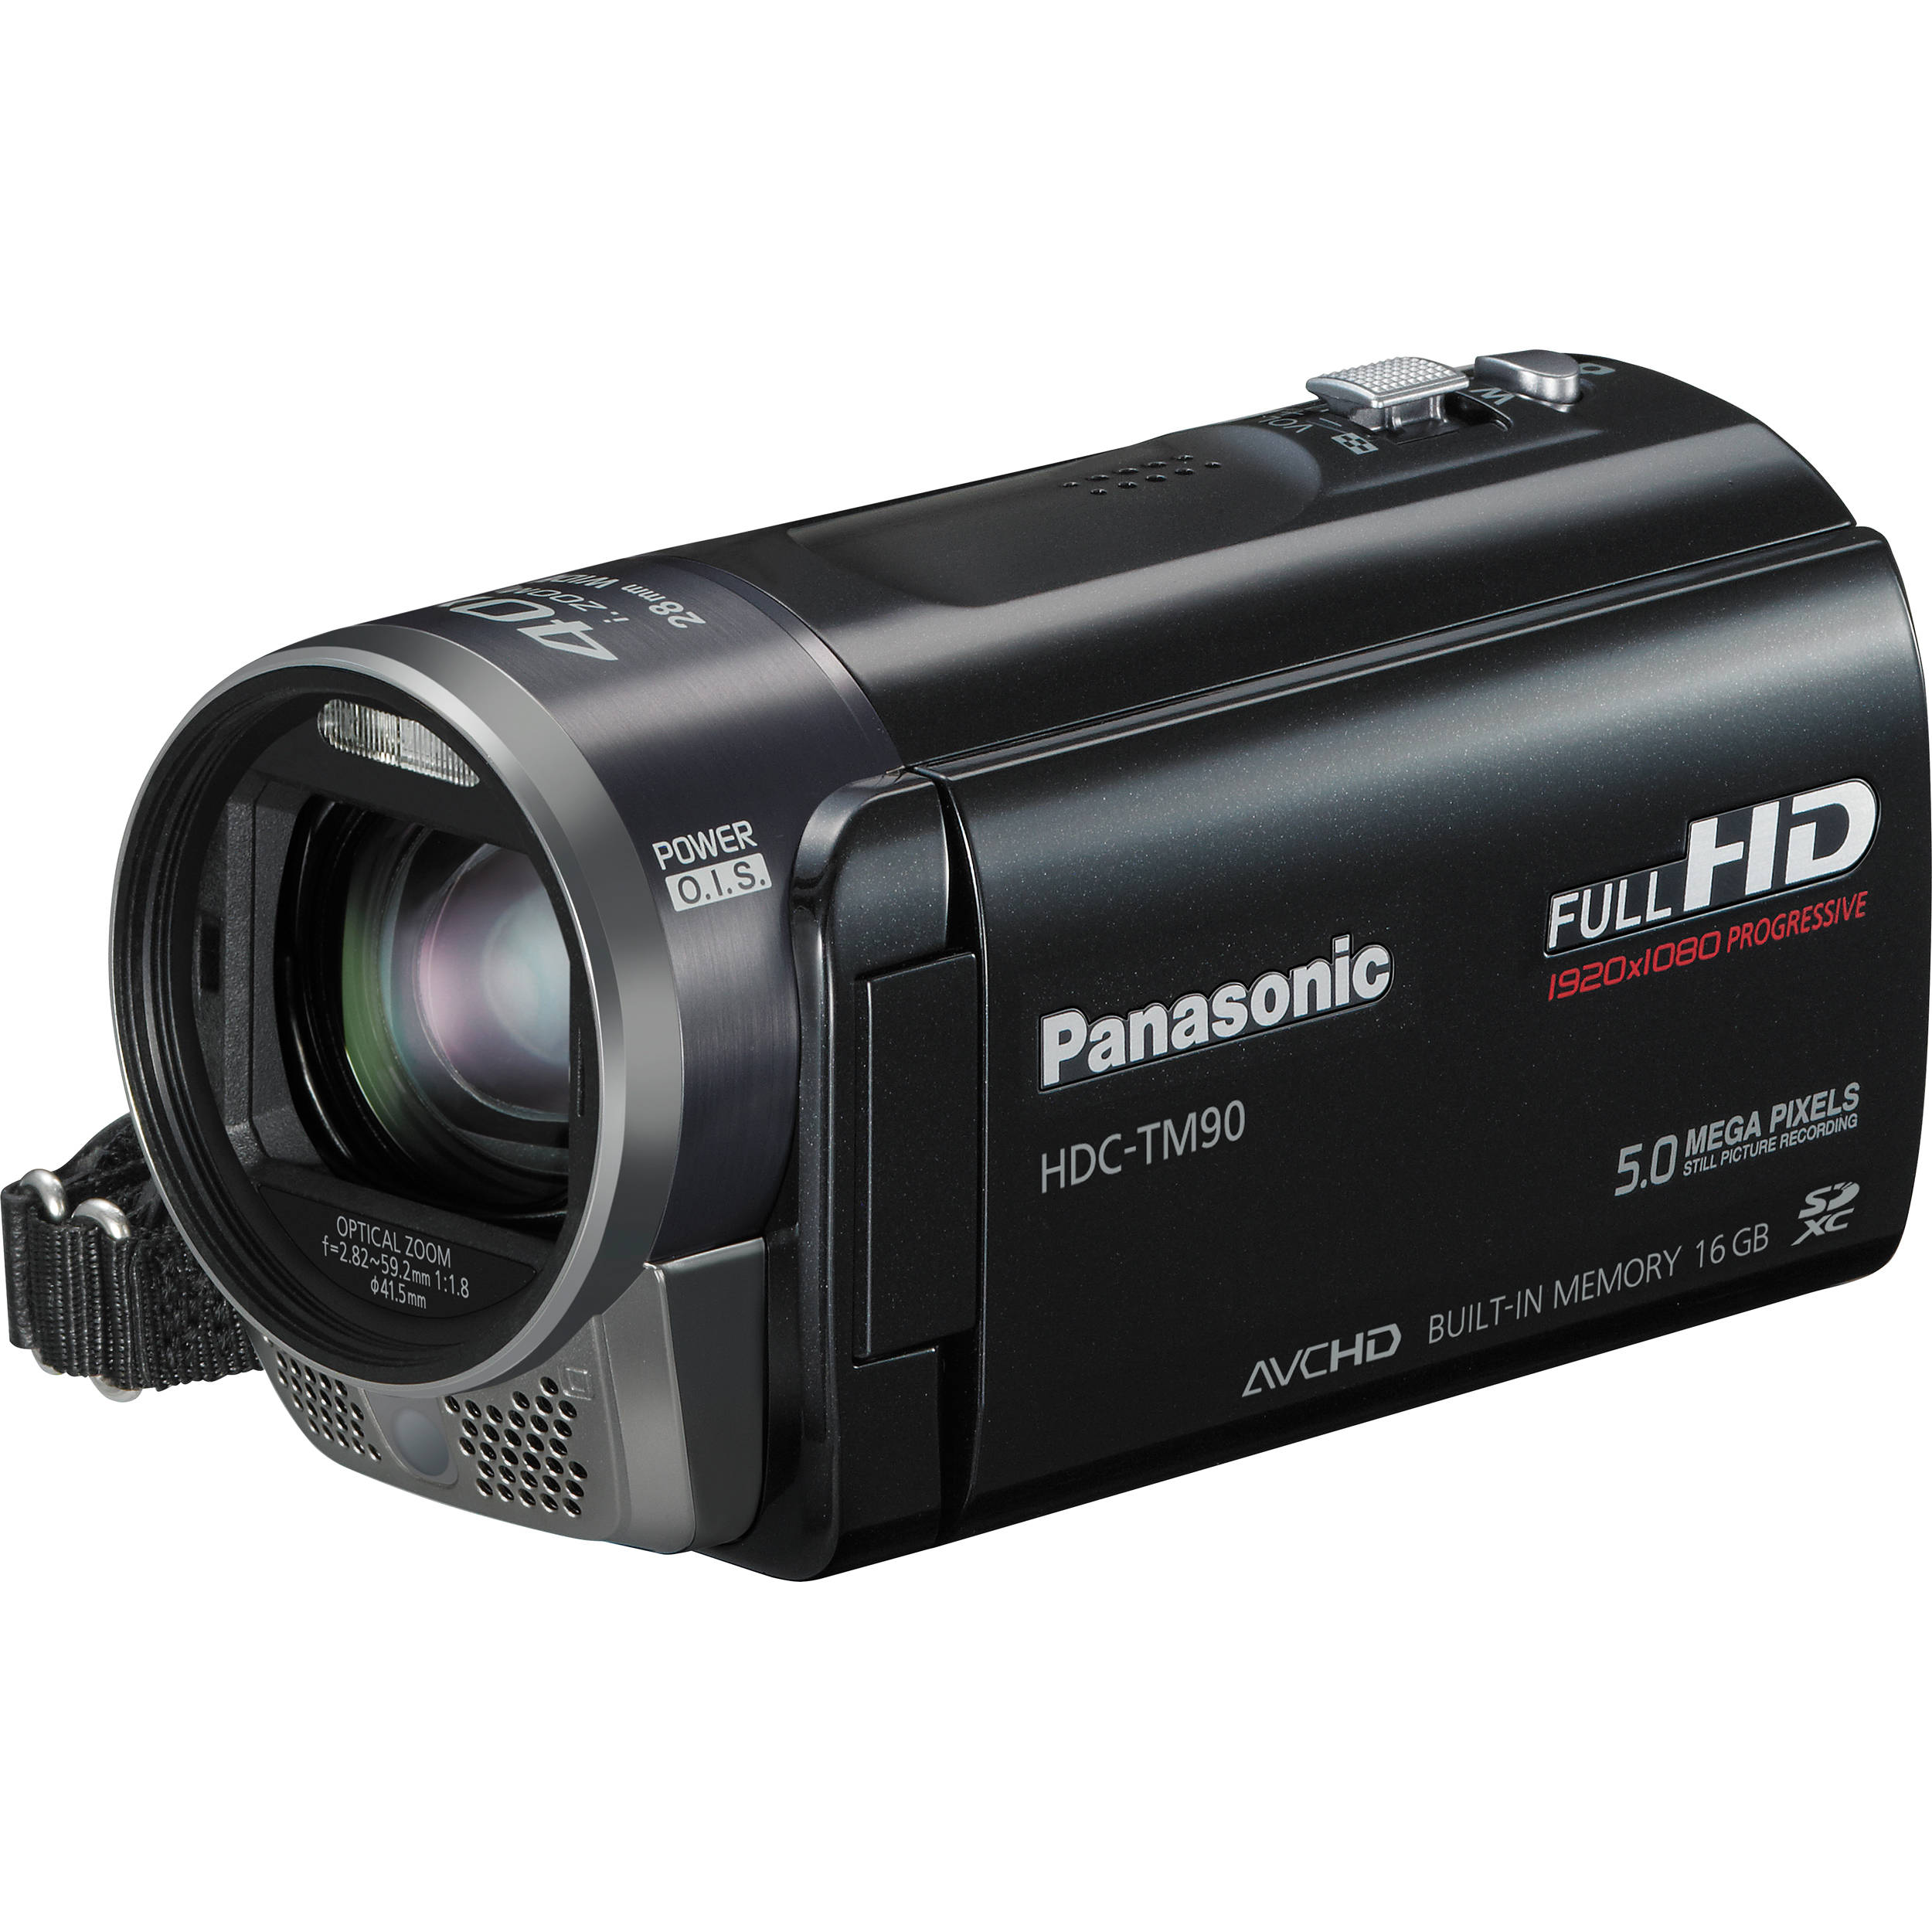 panasonic hdc tm90 high definition camcorder hdc tm90k b h photo rh bhphotovideo com Panasonic Owner's Manual Panasonic Cordless Phones